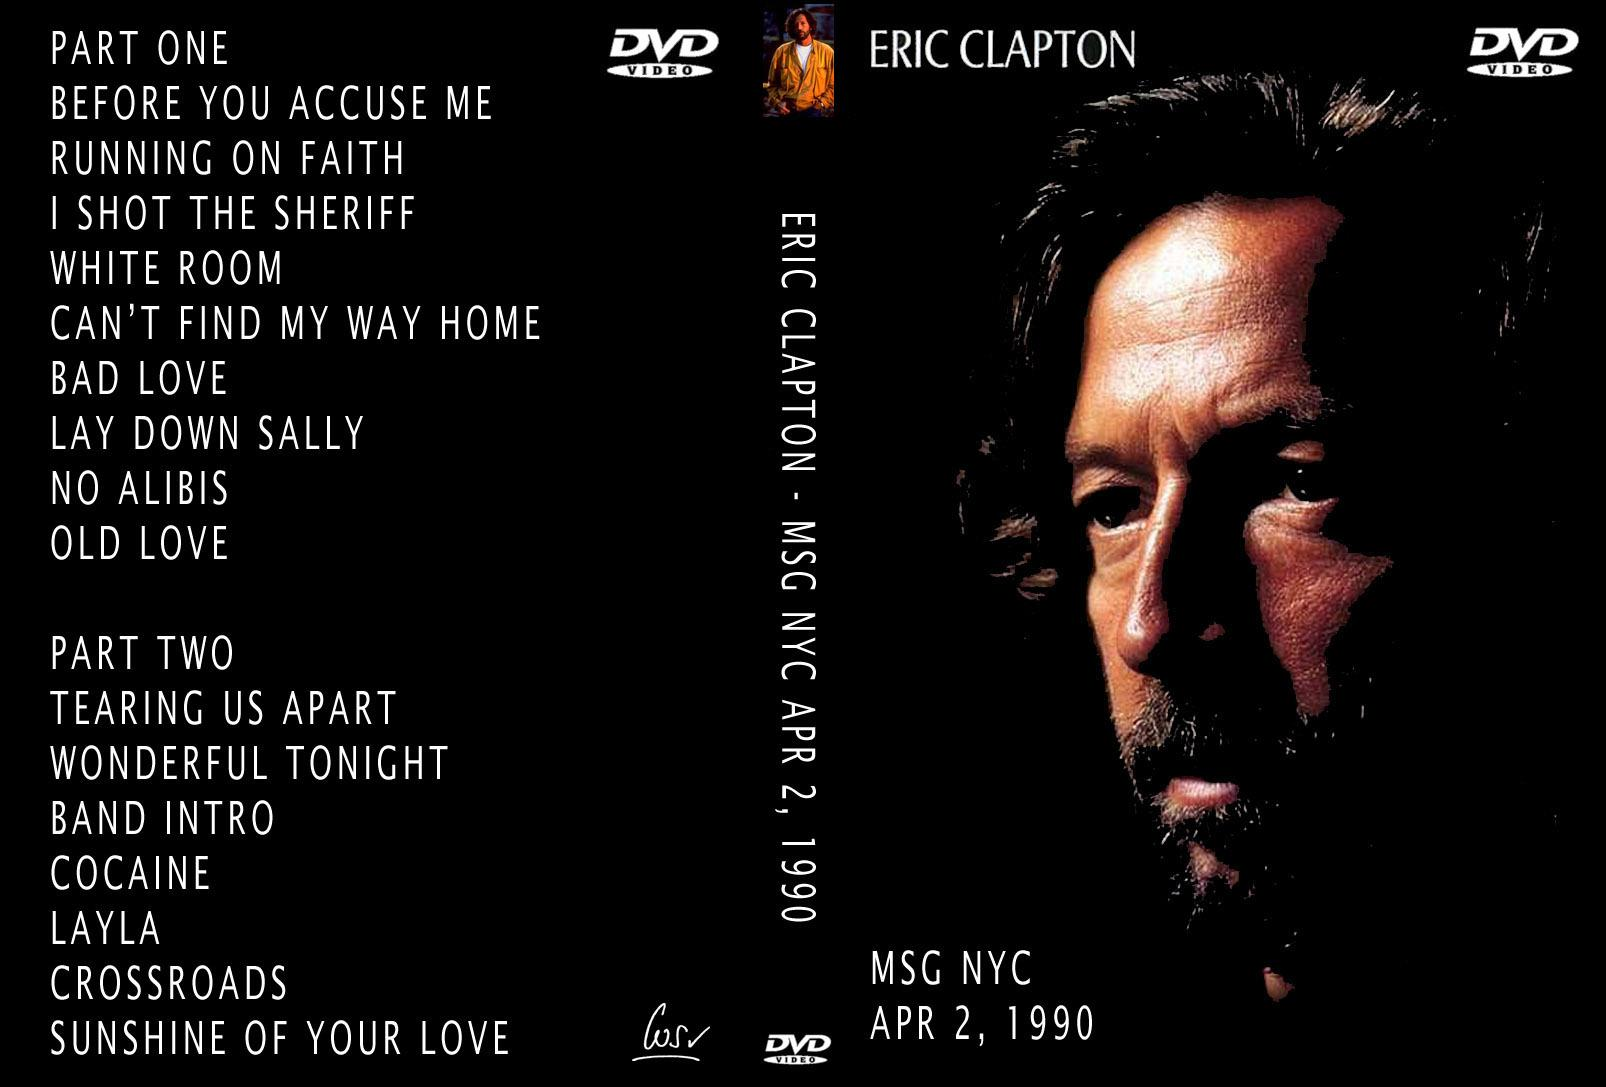 Eric Clapton Madison Square Garden April 2 1990 Dvd